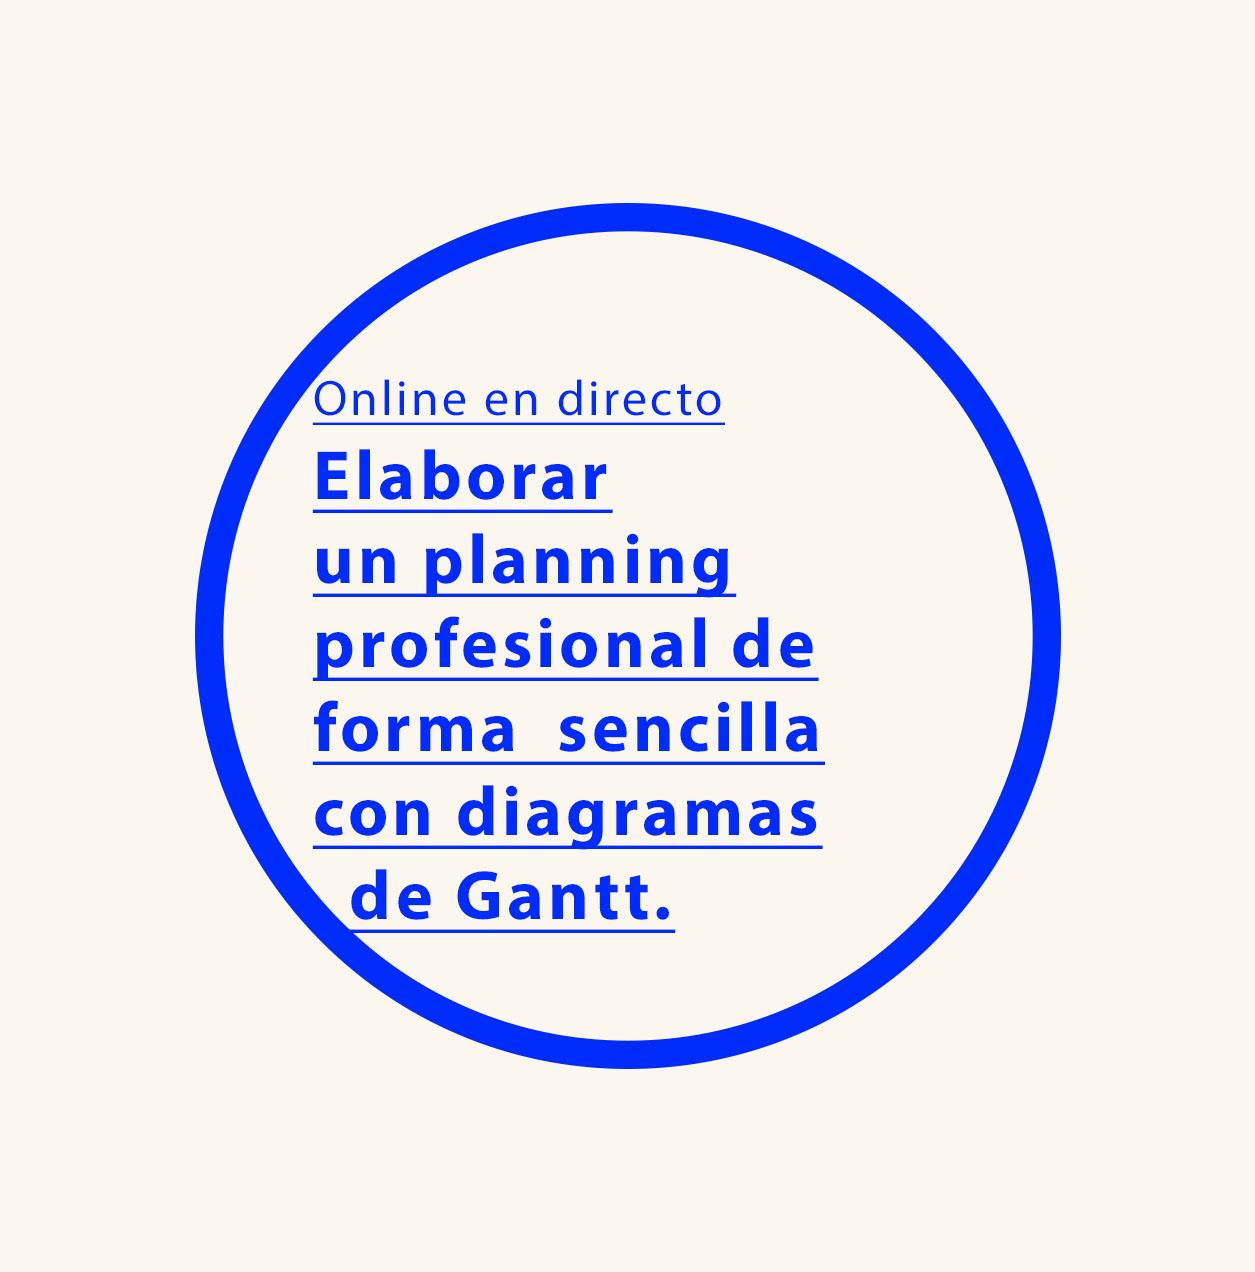 Taller iniciación Online: elaborar un planning profesional de forma sencilla con diagramas de Gantt.